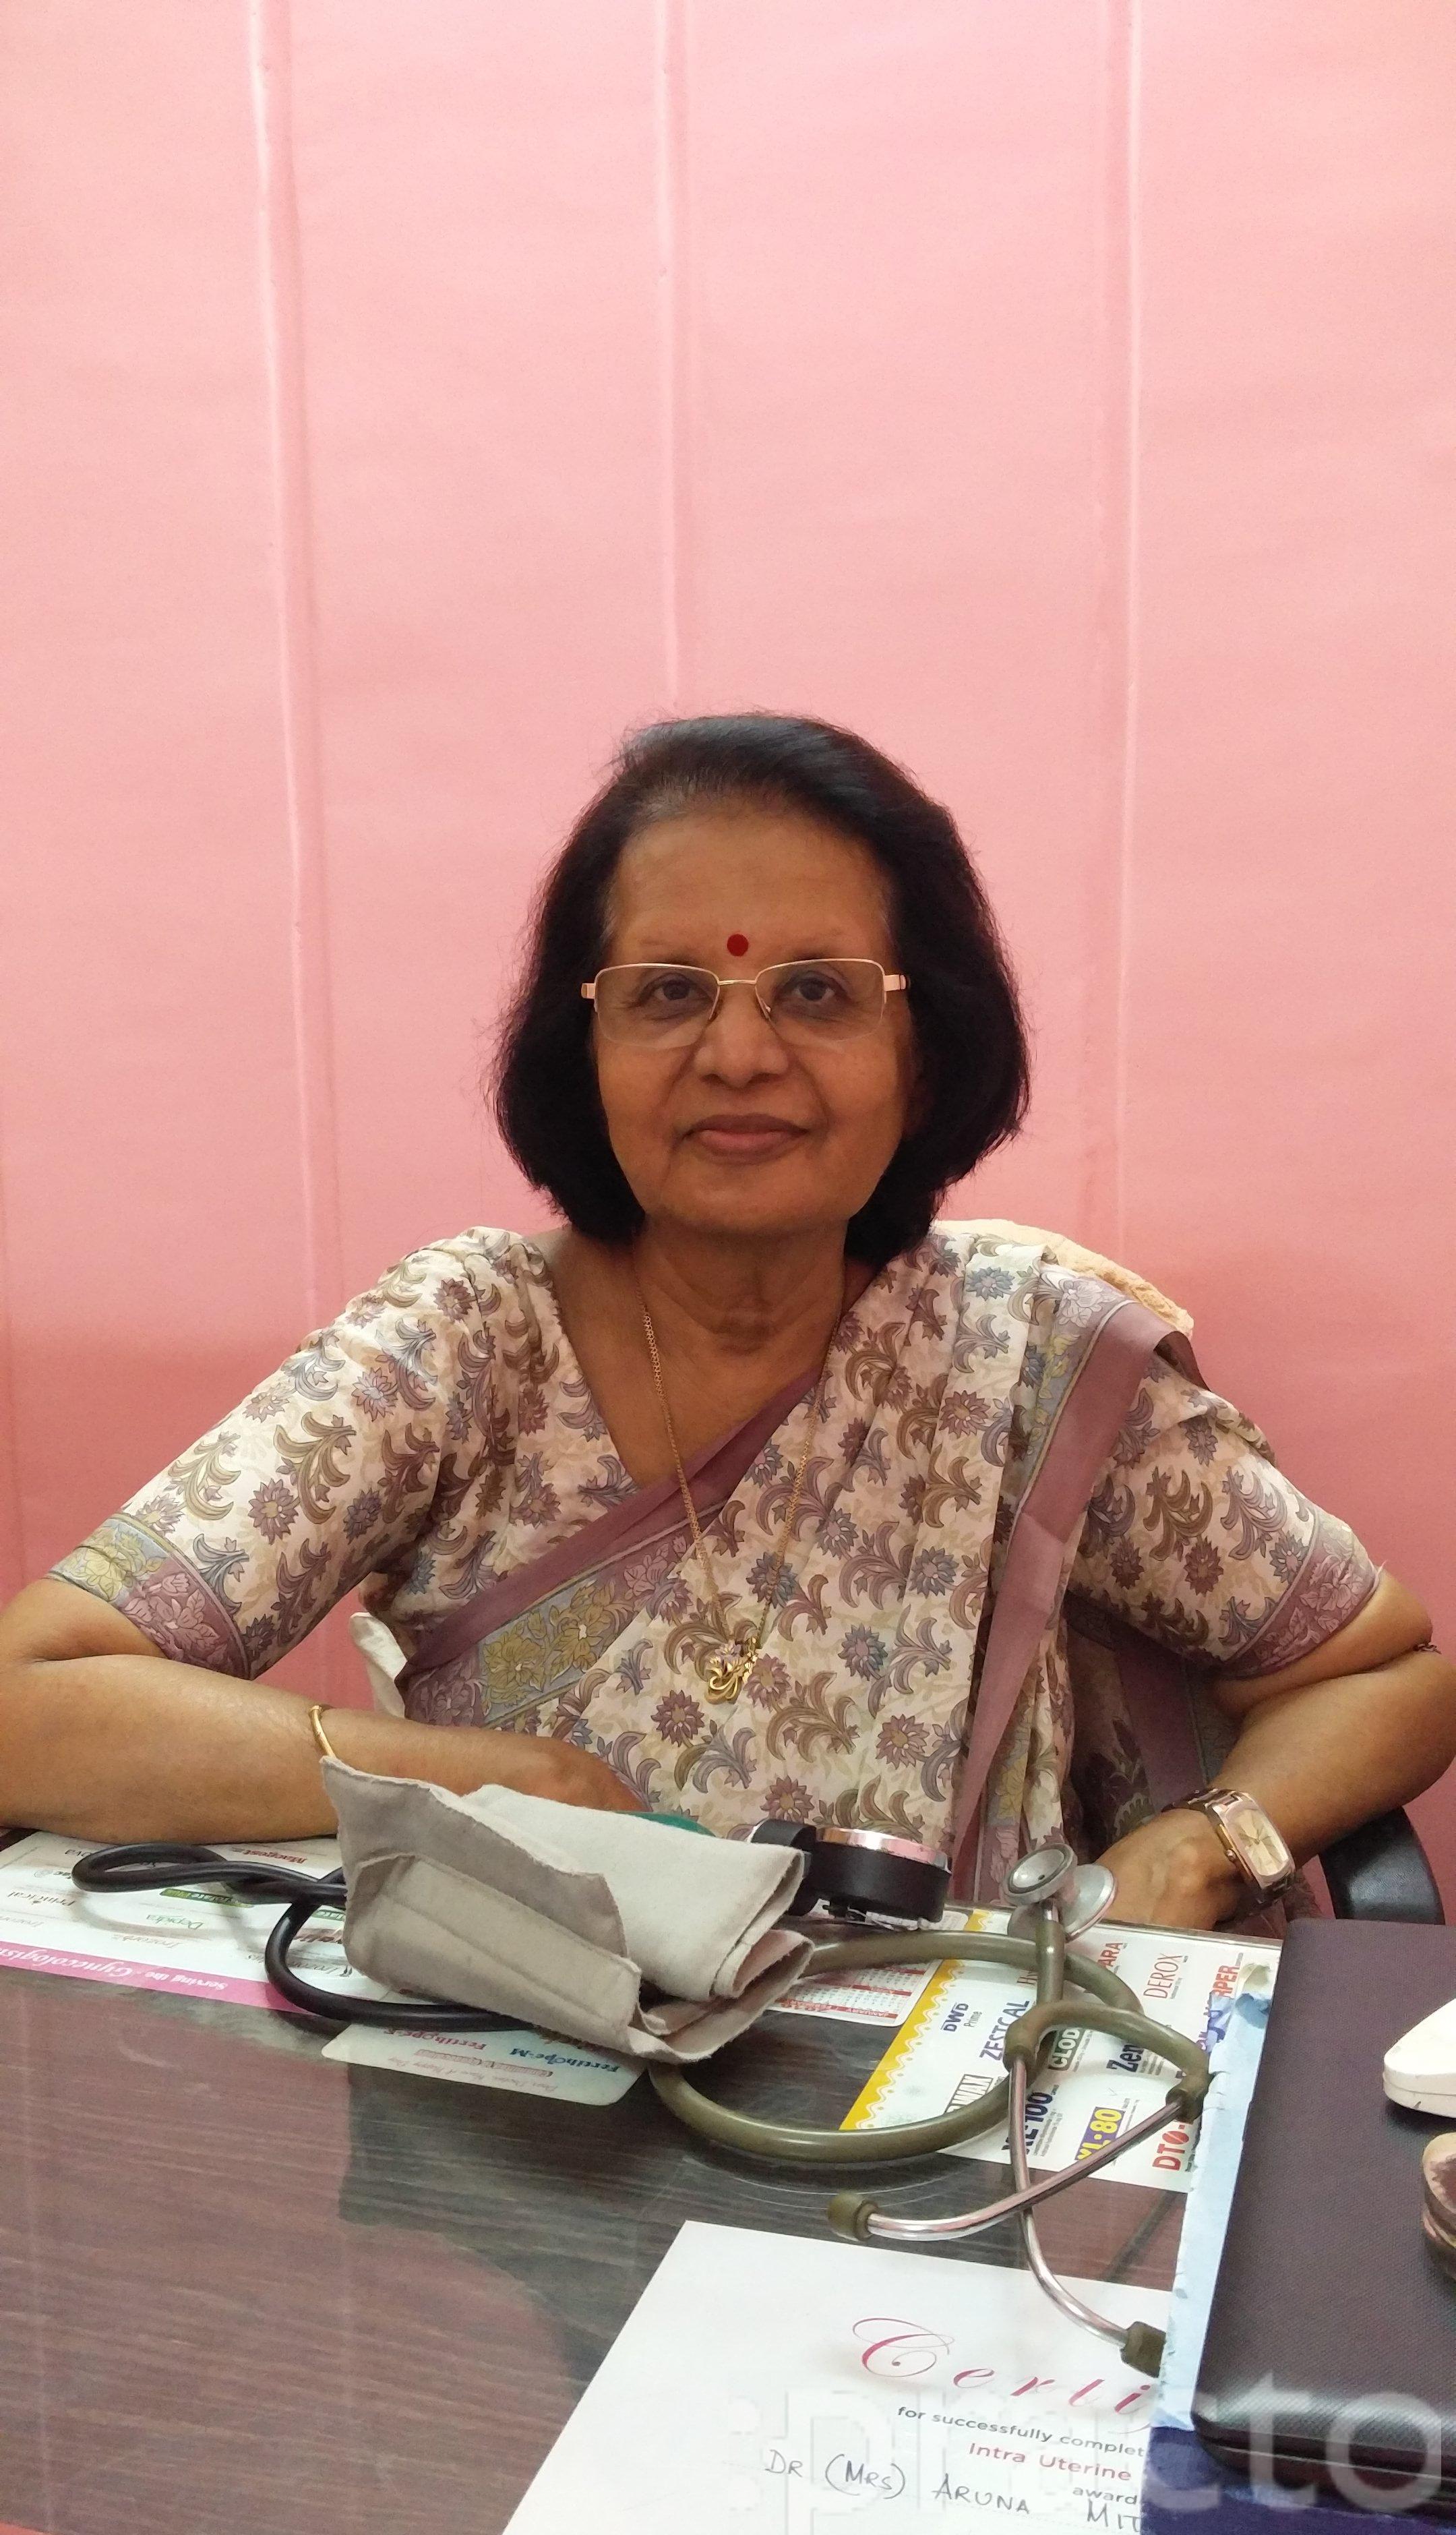 Aruna Mitra display image